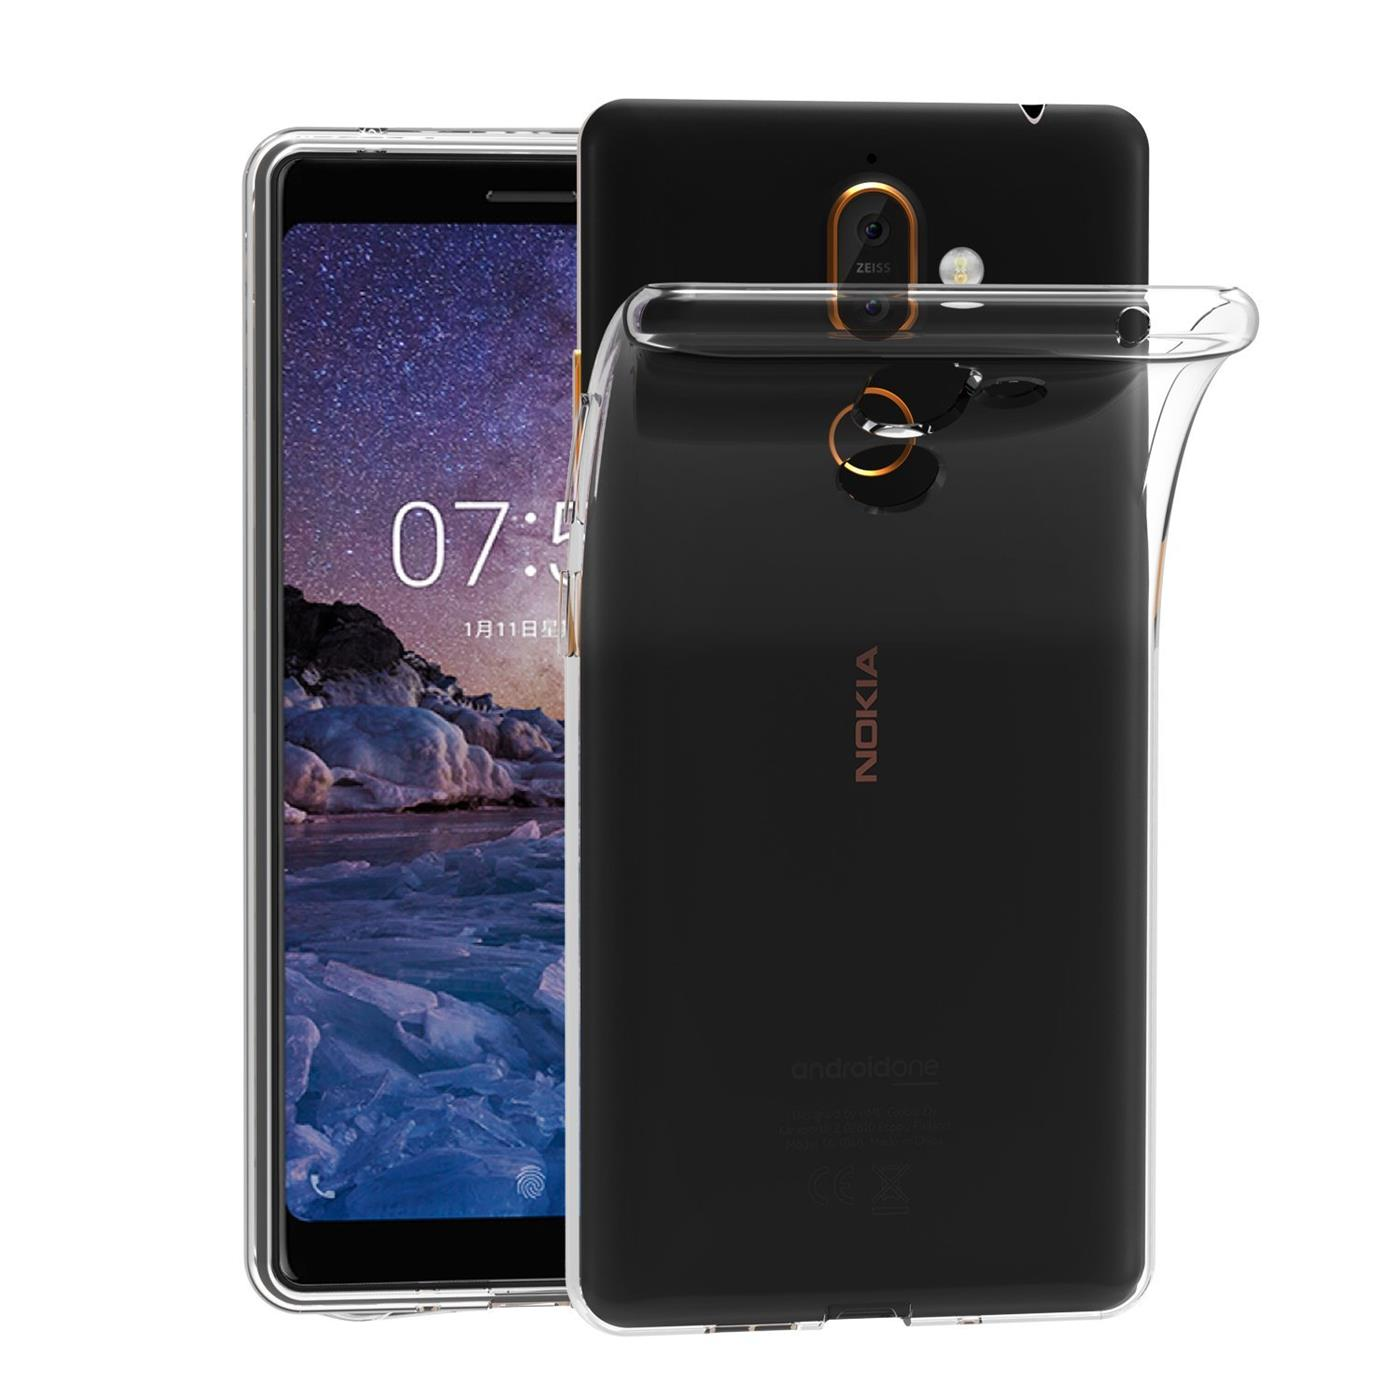 Nokia-7-Plus-Thin-Silikon-Klar-Case-Cover-Ultra-Slim-Stossfeste-Gel-Rueckseite Indexbild 9